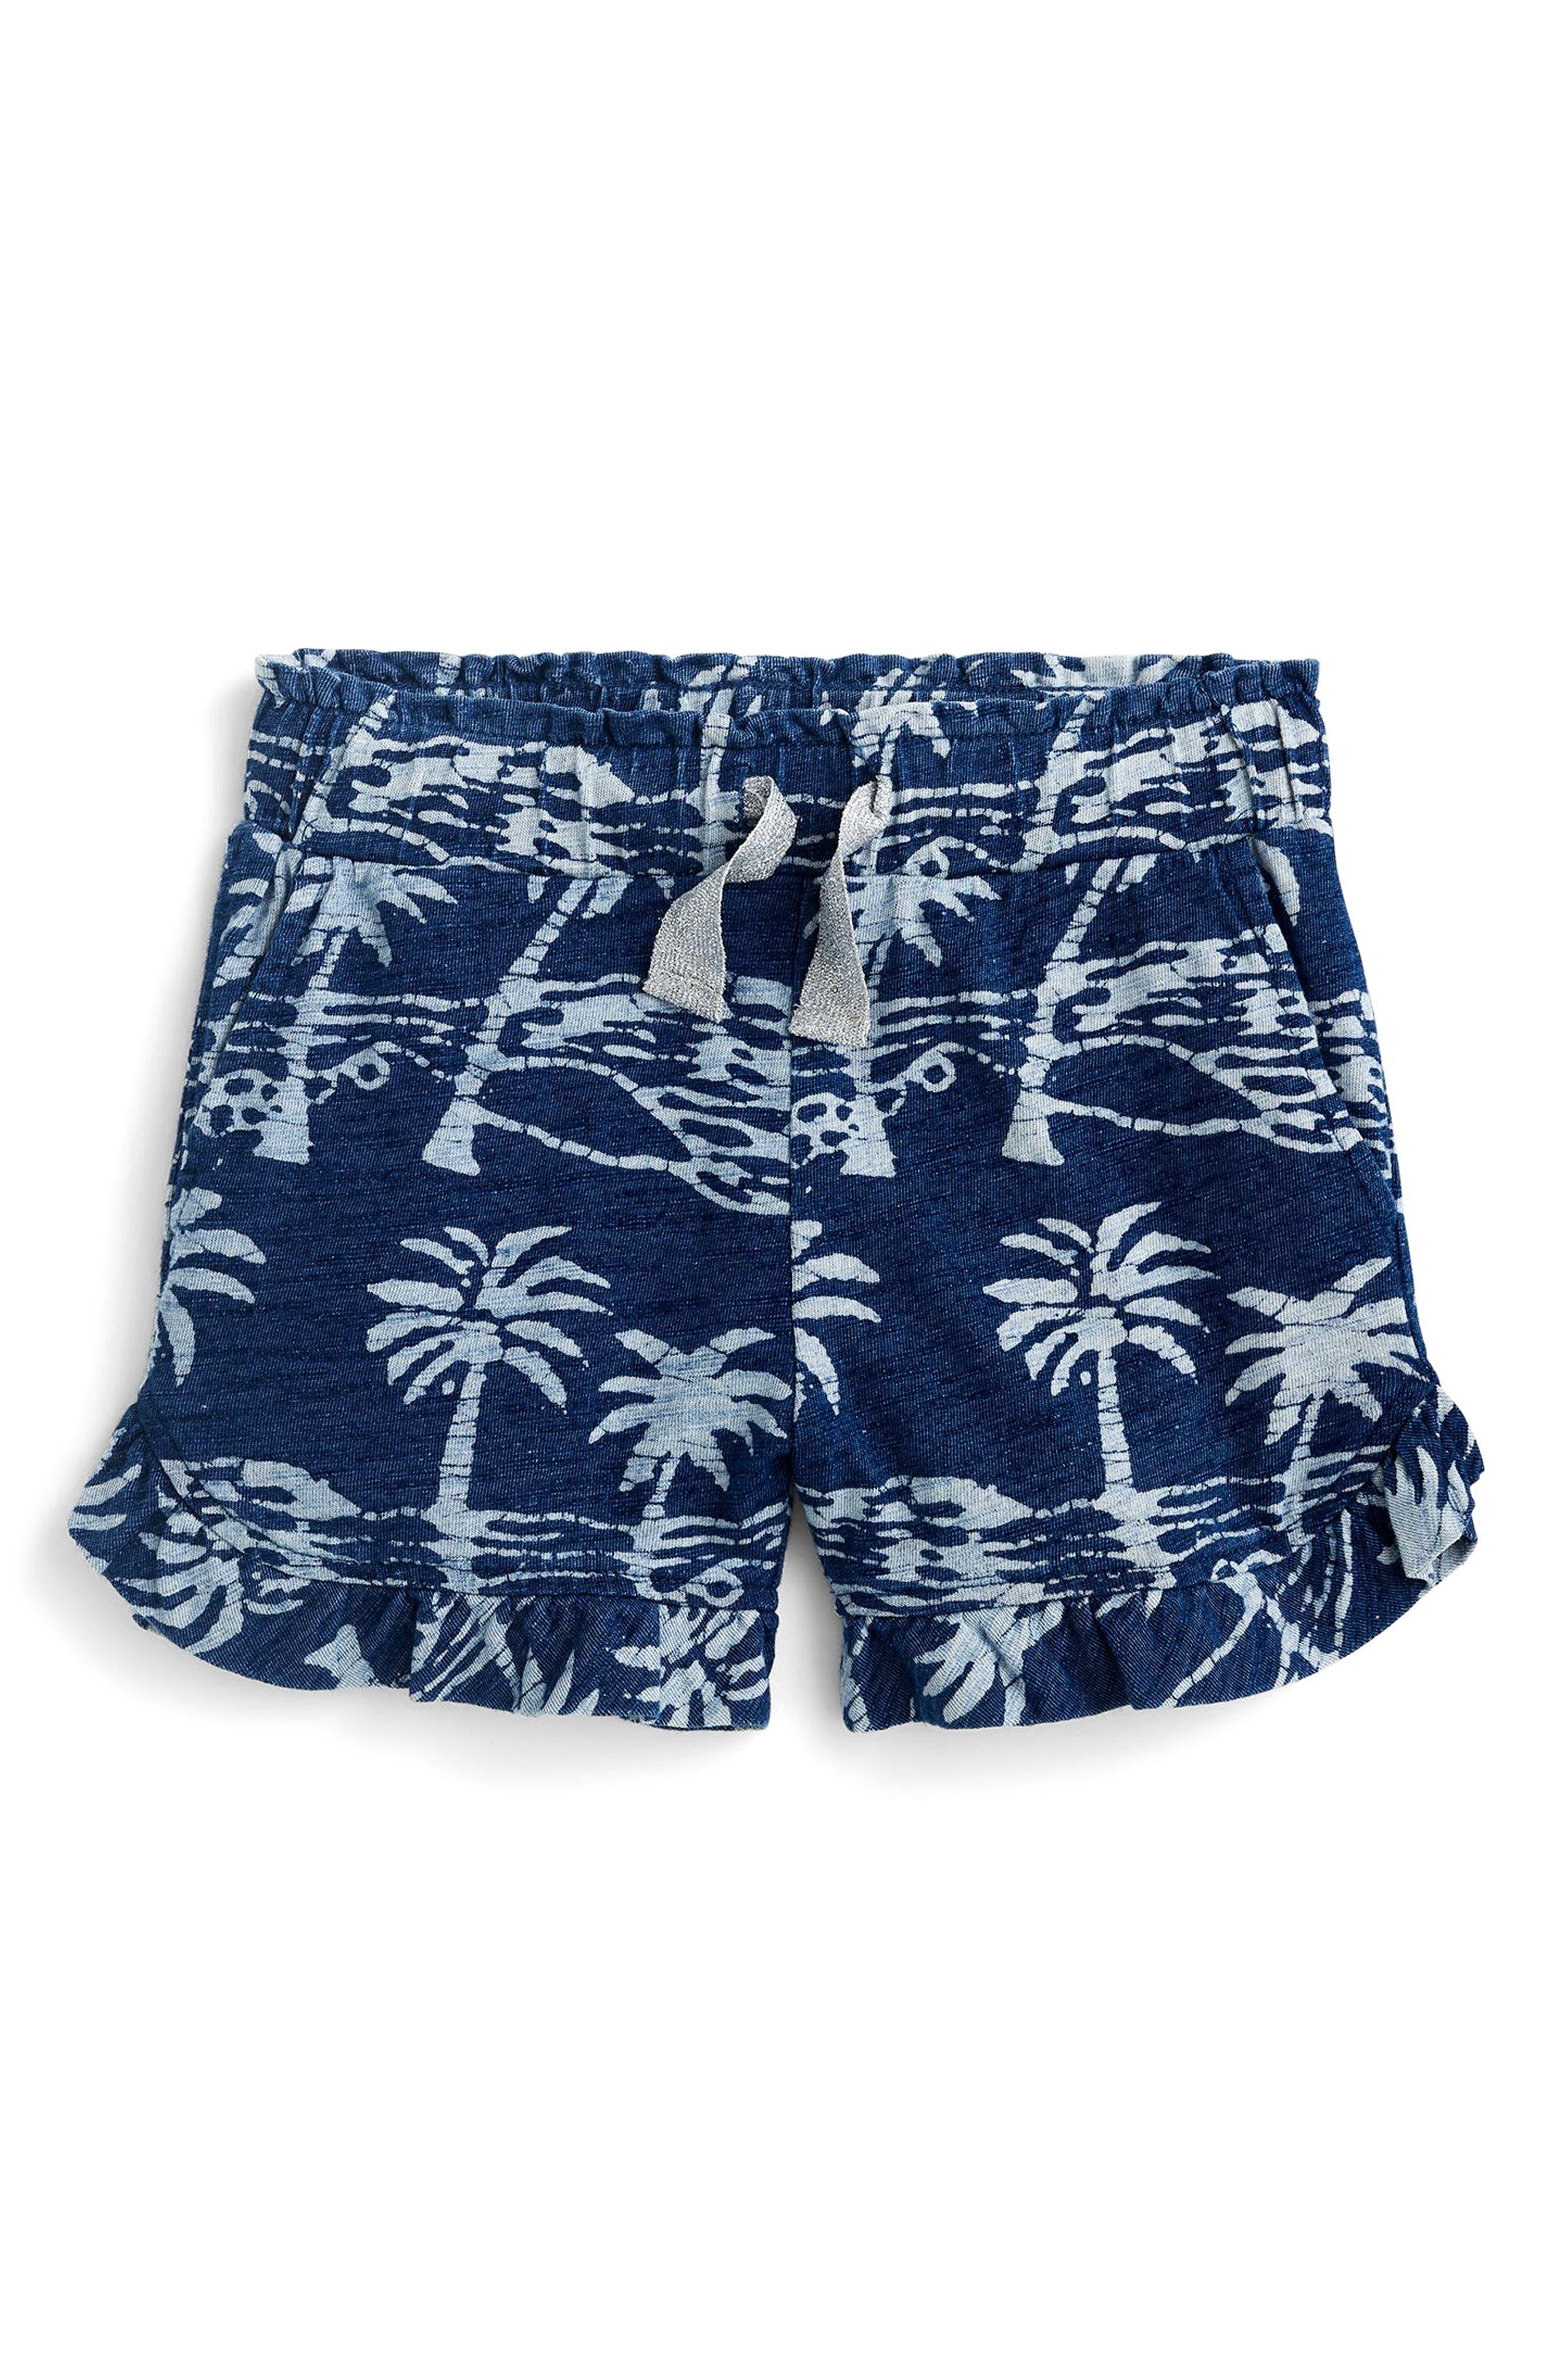 Paulette Palm Print Ruffle Shorts,                         Main,                         color, Indigo